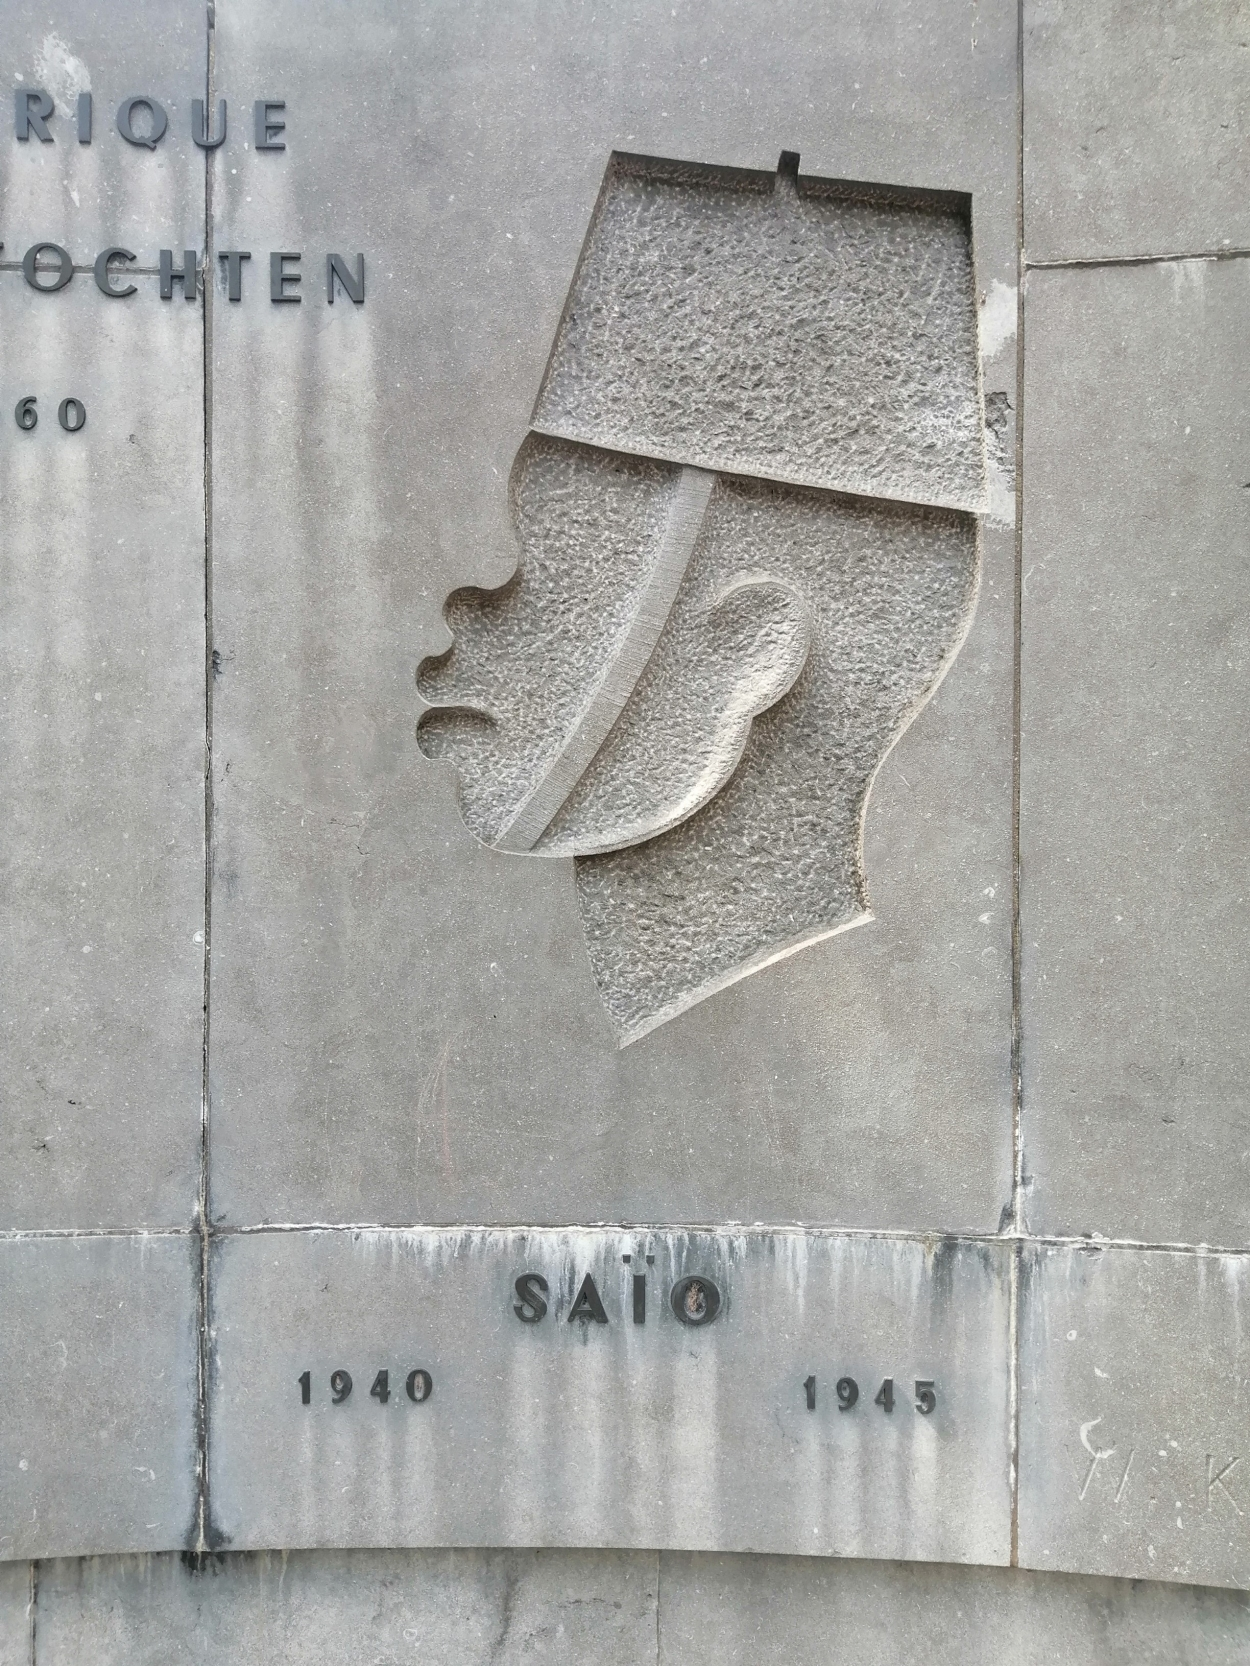 monument-riga-dAtail.jpg